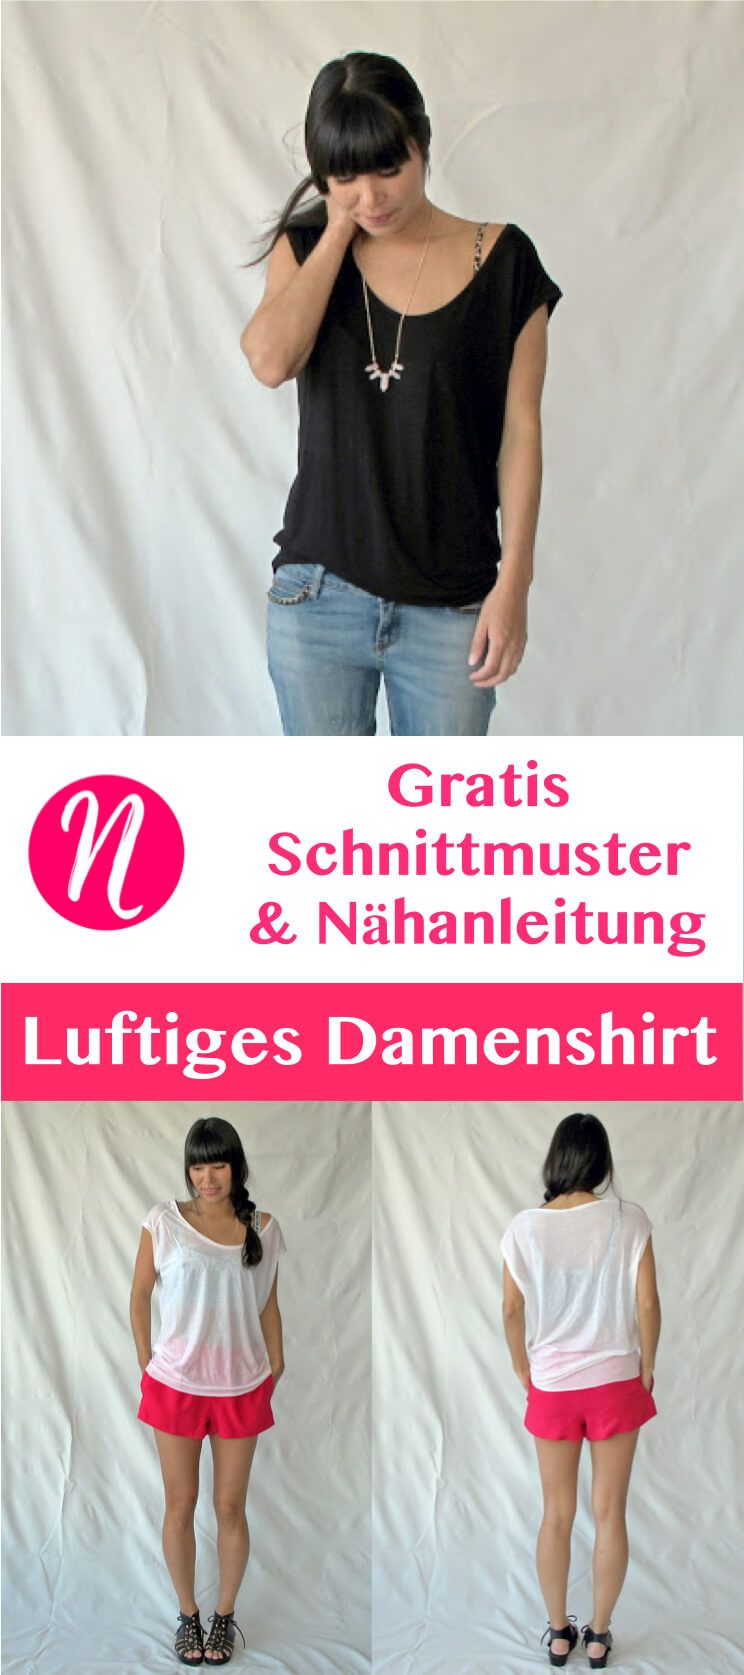 Das Elise-T-Shirt für Damen | Pinterest | Tiefer ausschnitt, Gratis ...